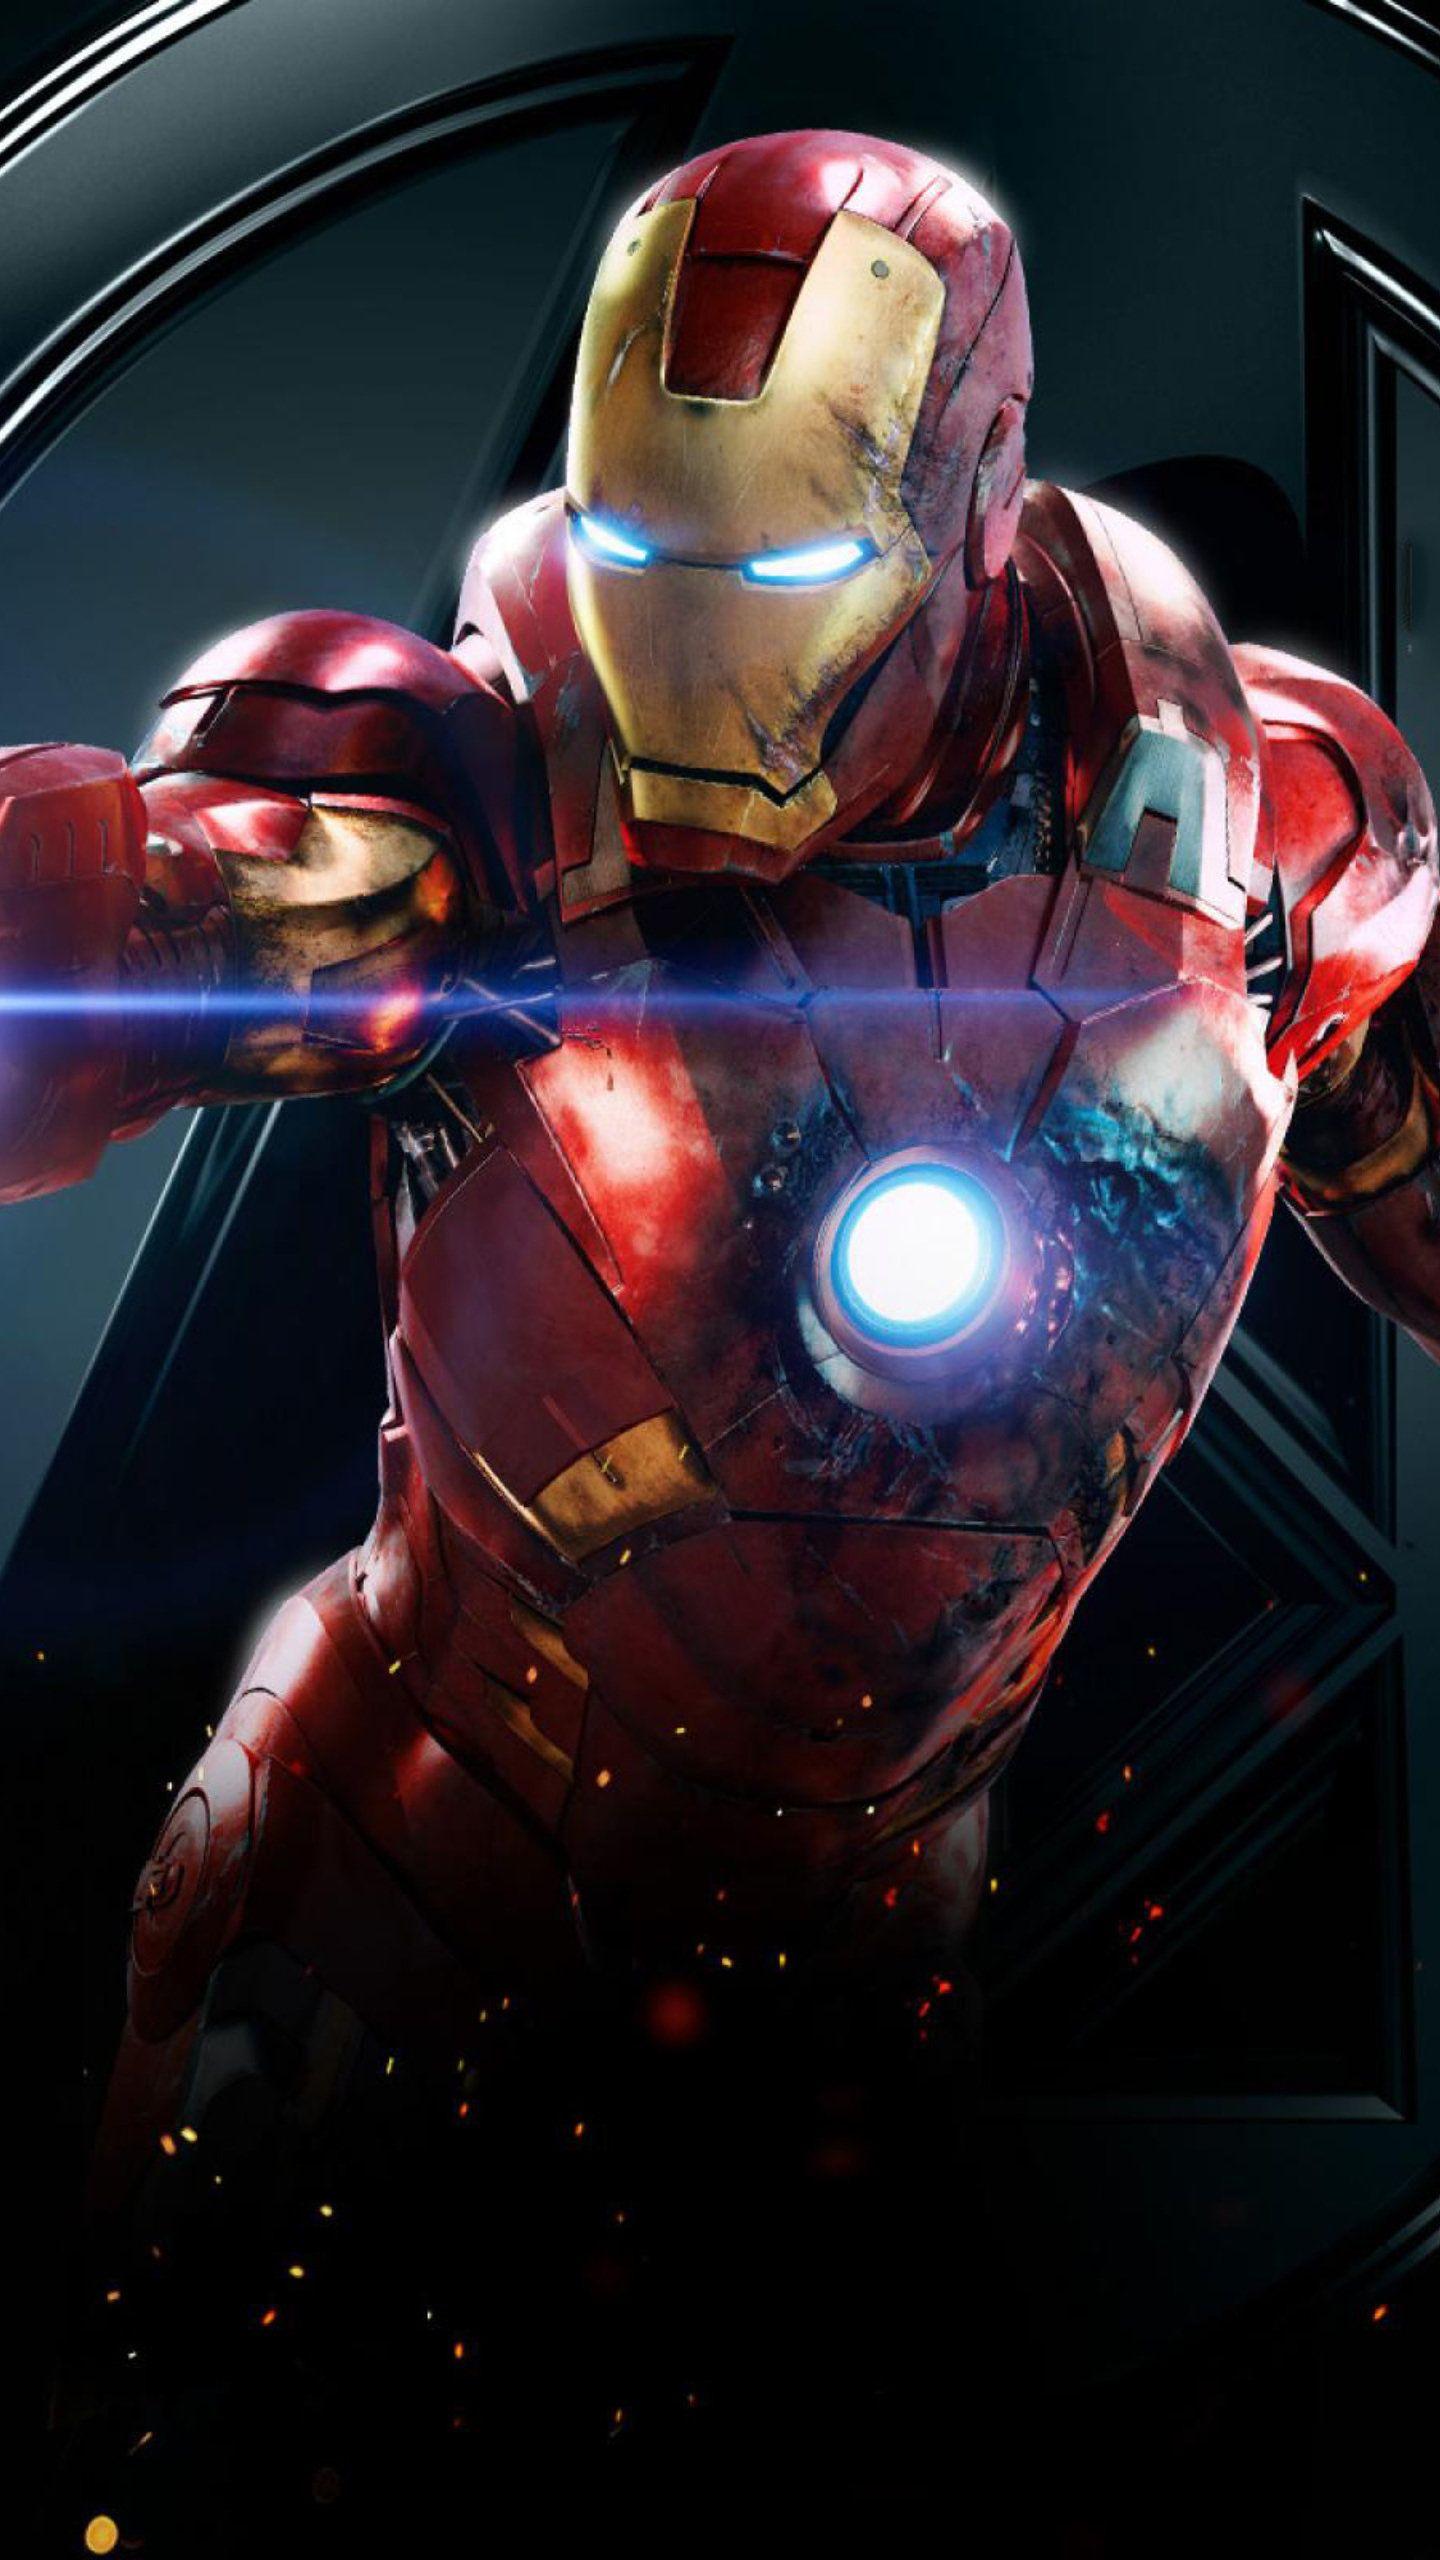 Iron Man Avengers Artwork Hd Superheroes Wallpapers Photos And